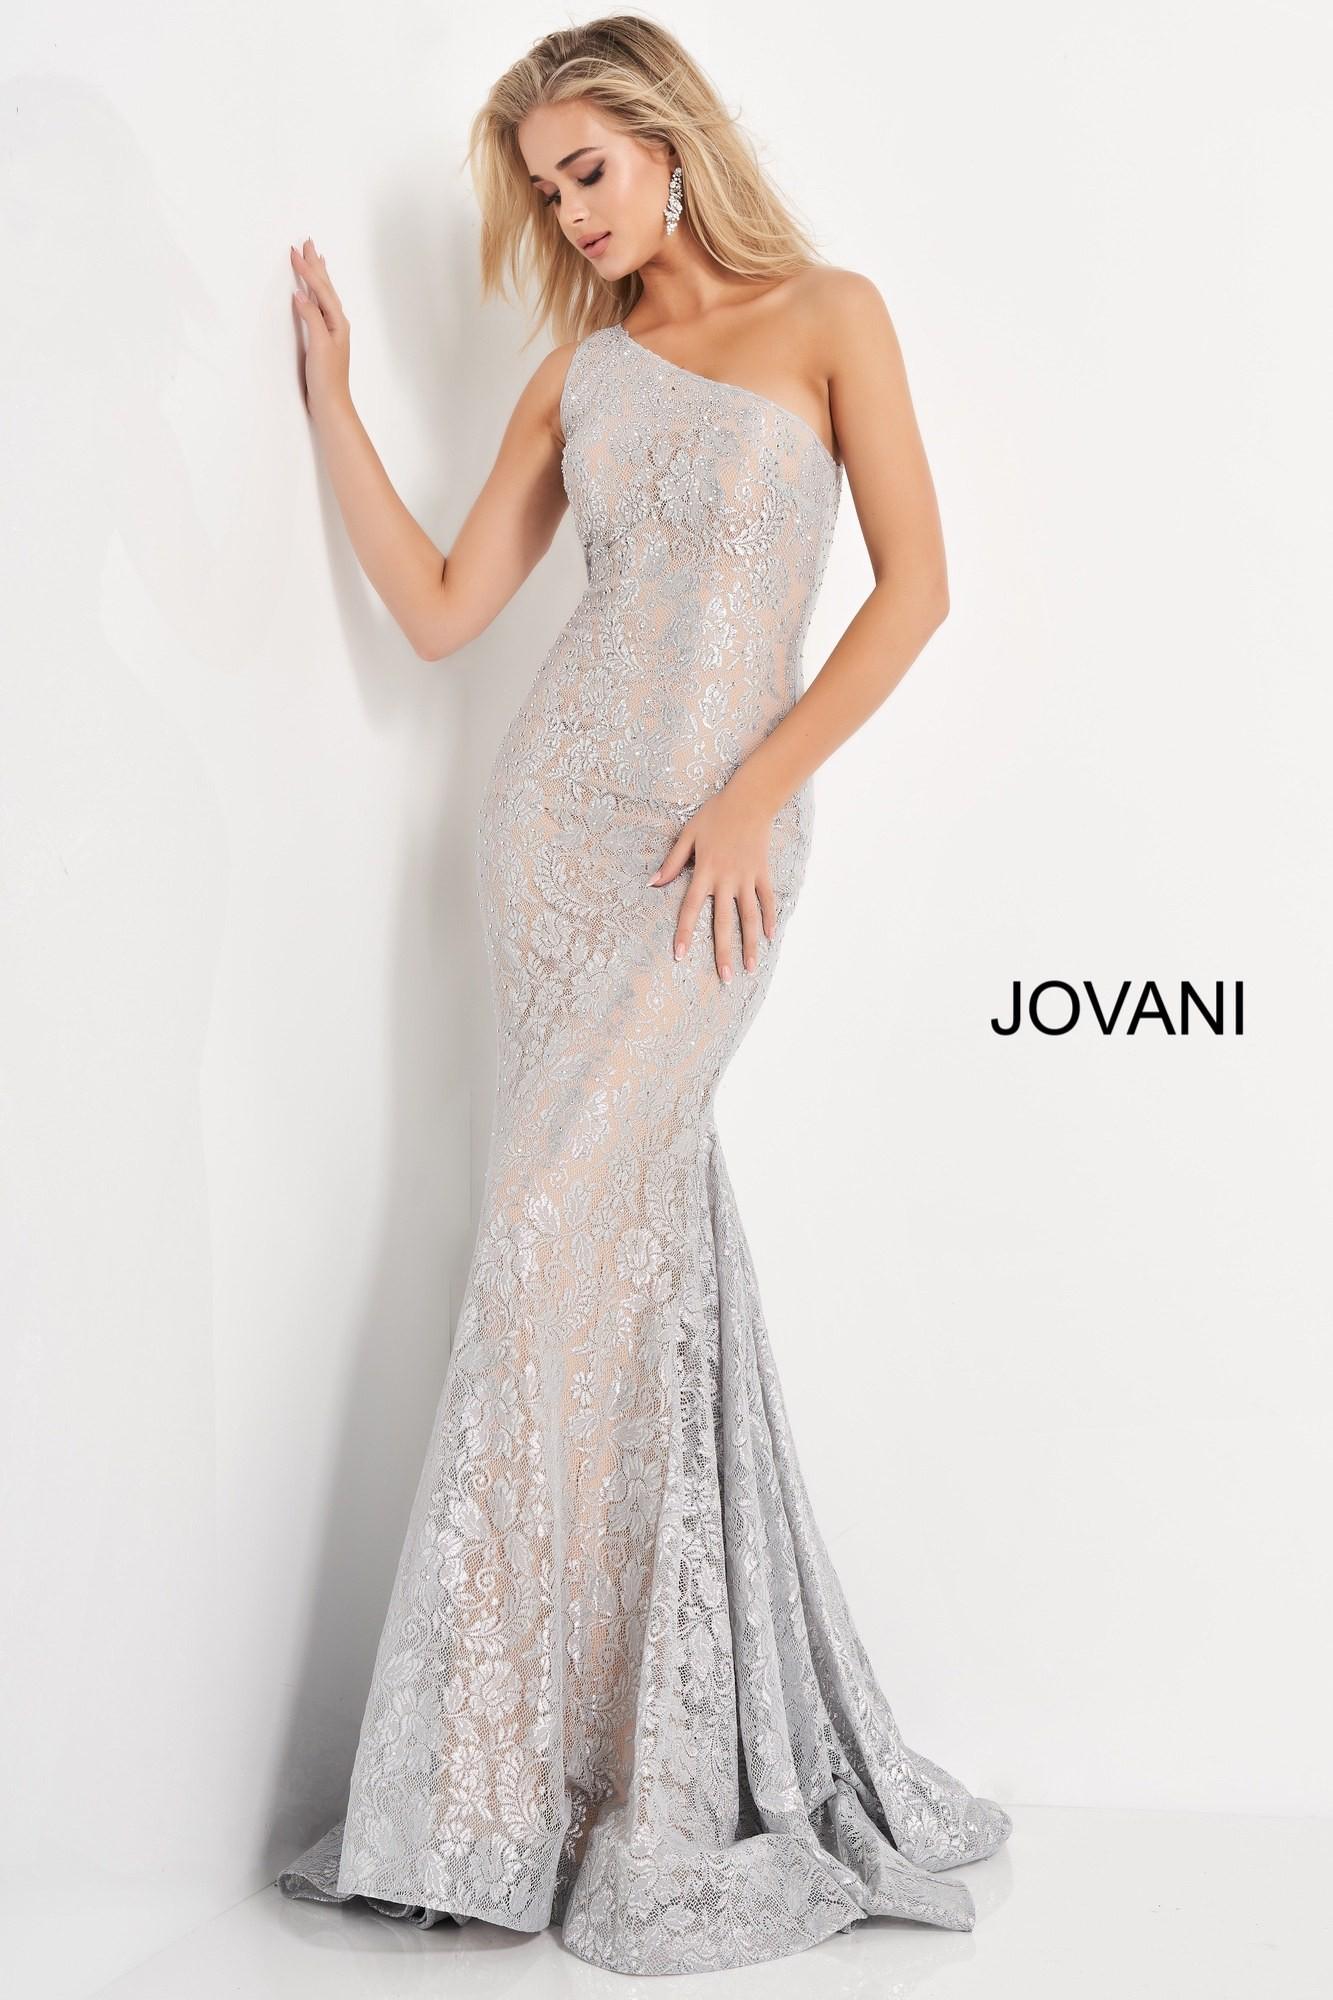 Jovani 00353 One Shoulder Lace Prom Dress